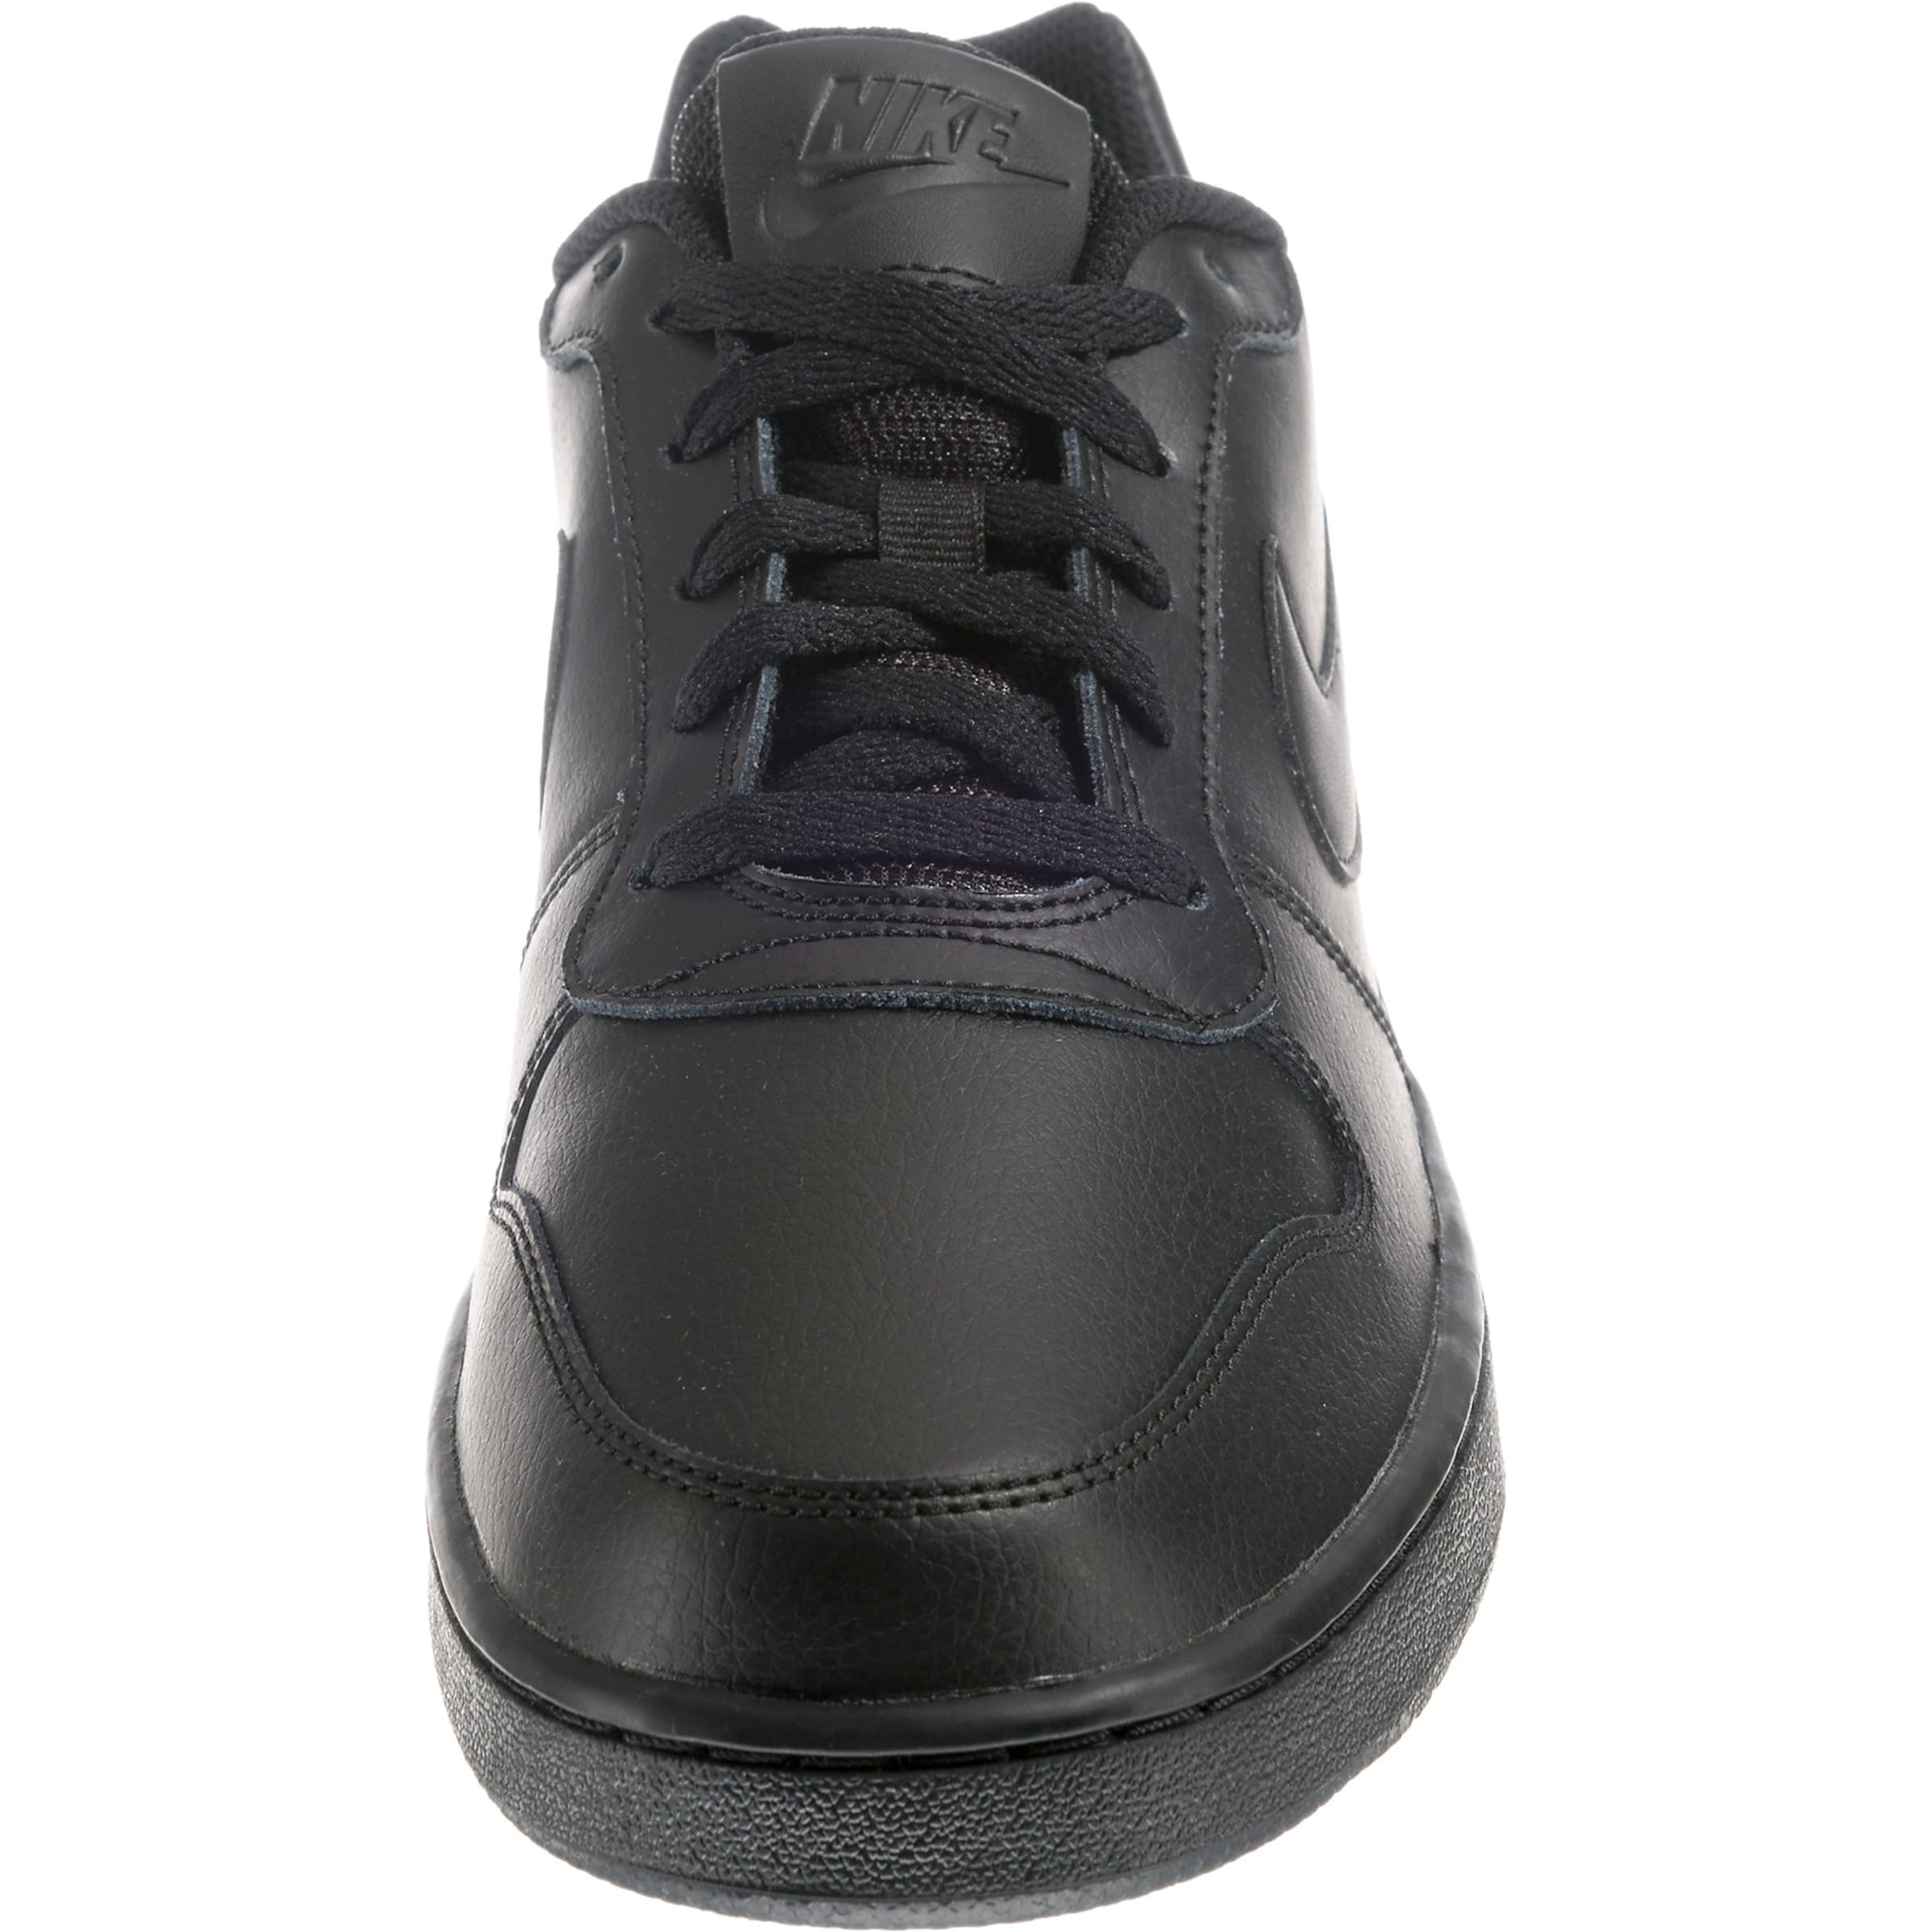 Sportswear Nike Sneakers 'ebernon' Schwarz In 5q4LRAj3